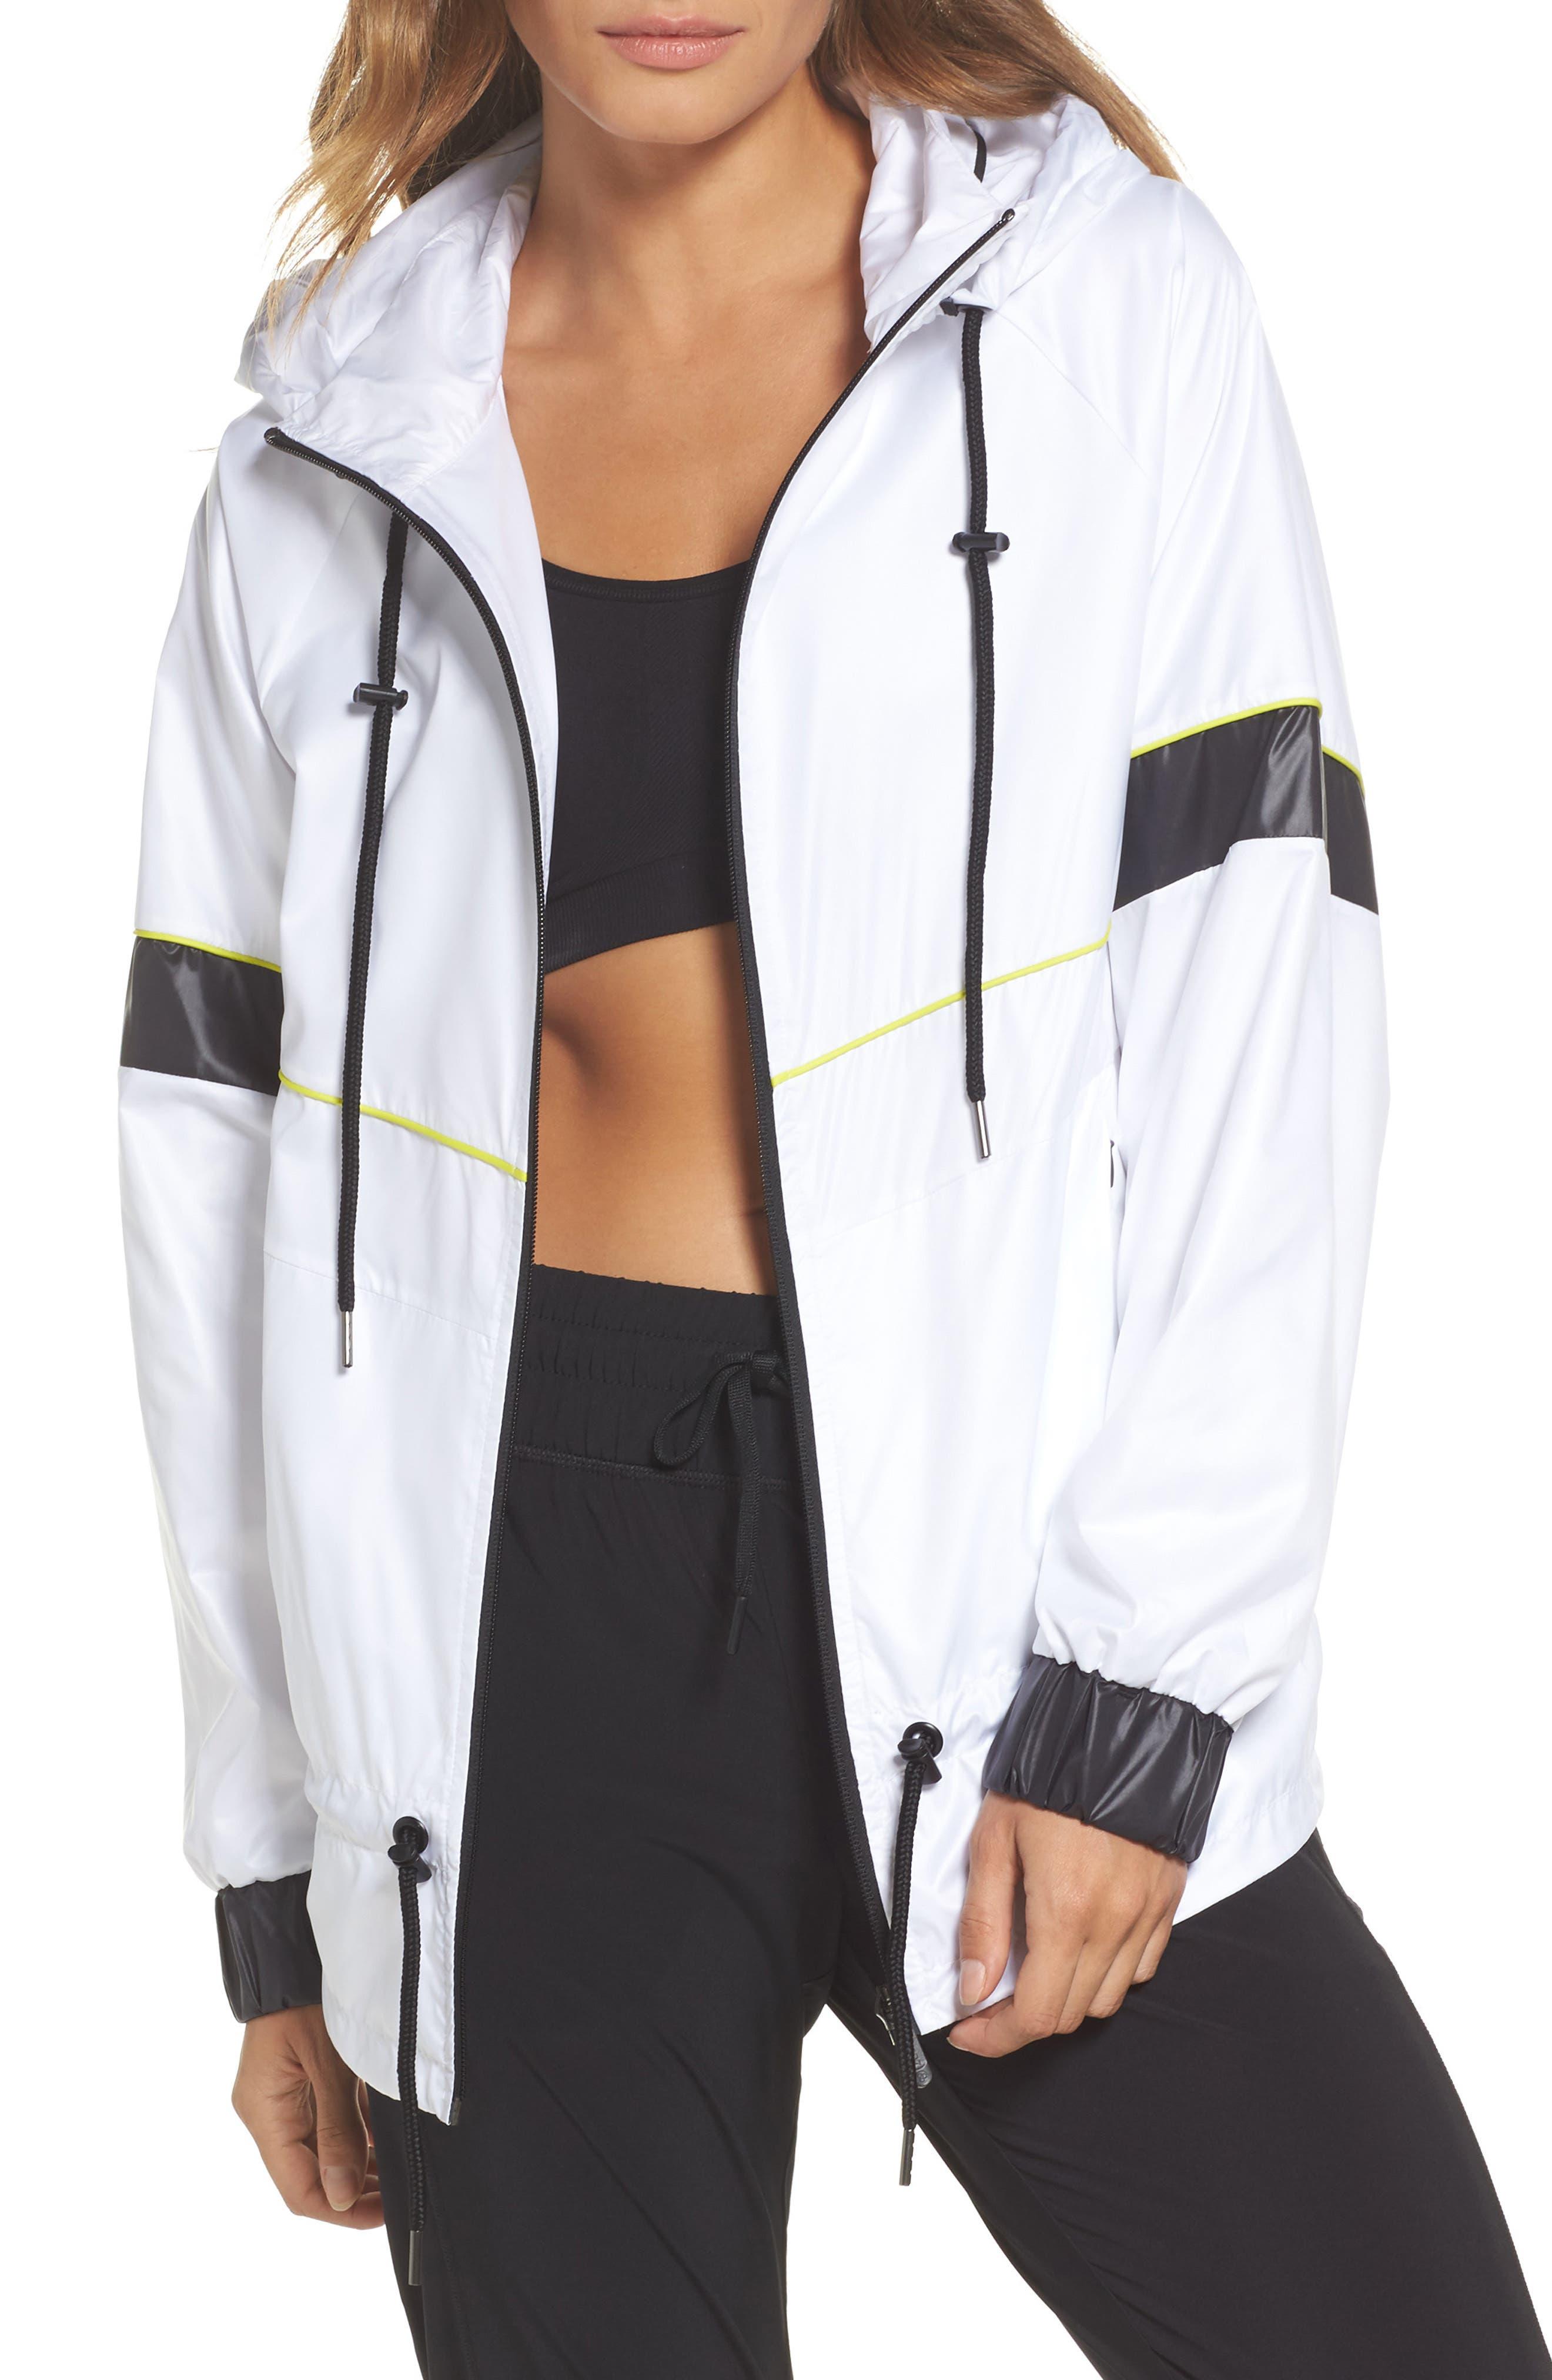 Shadowboxer Jacket,                         Main,                         color, 100